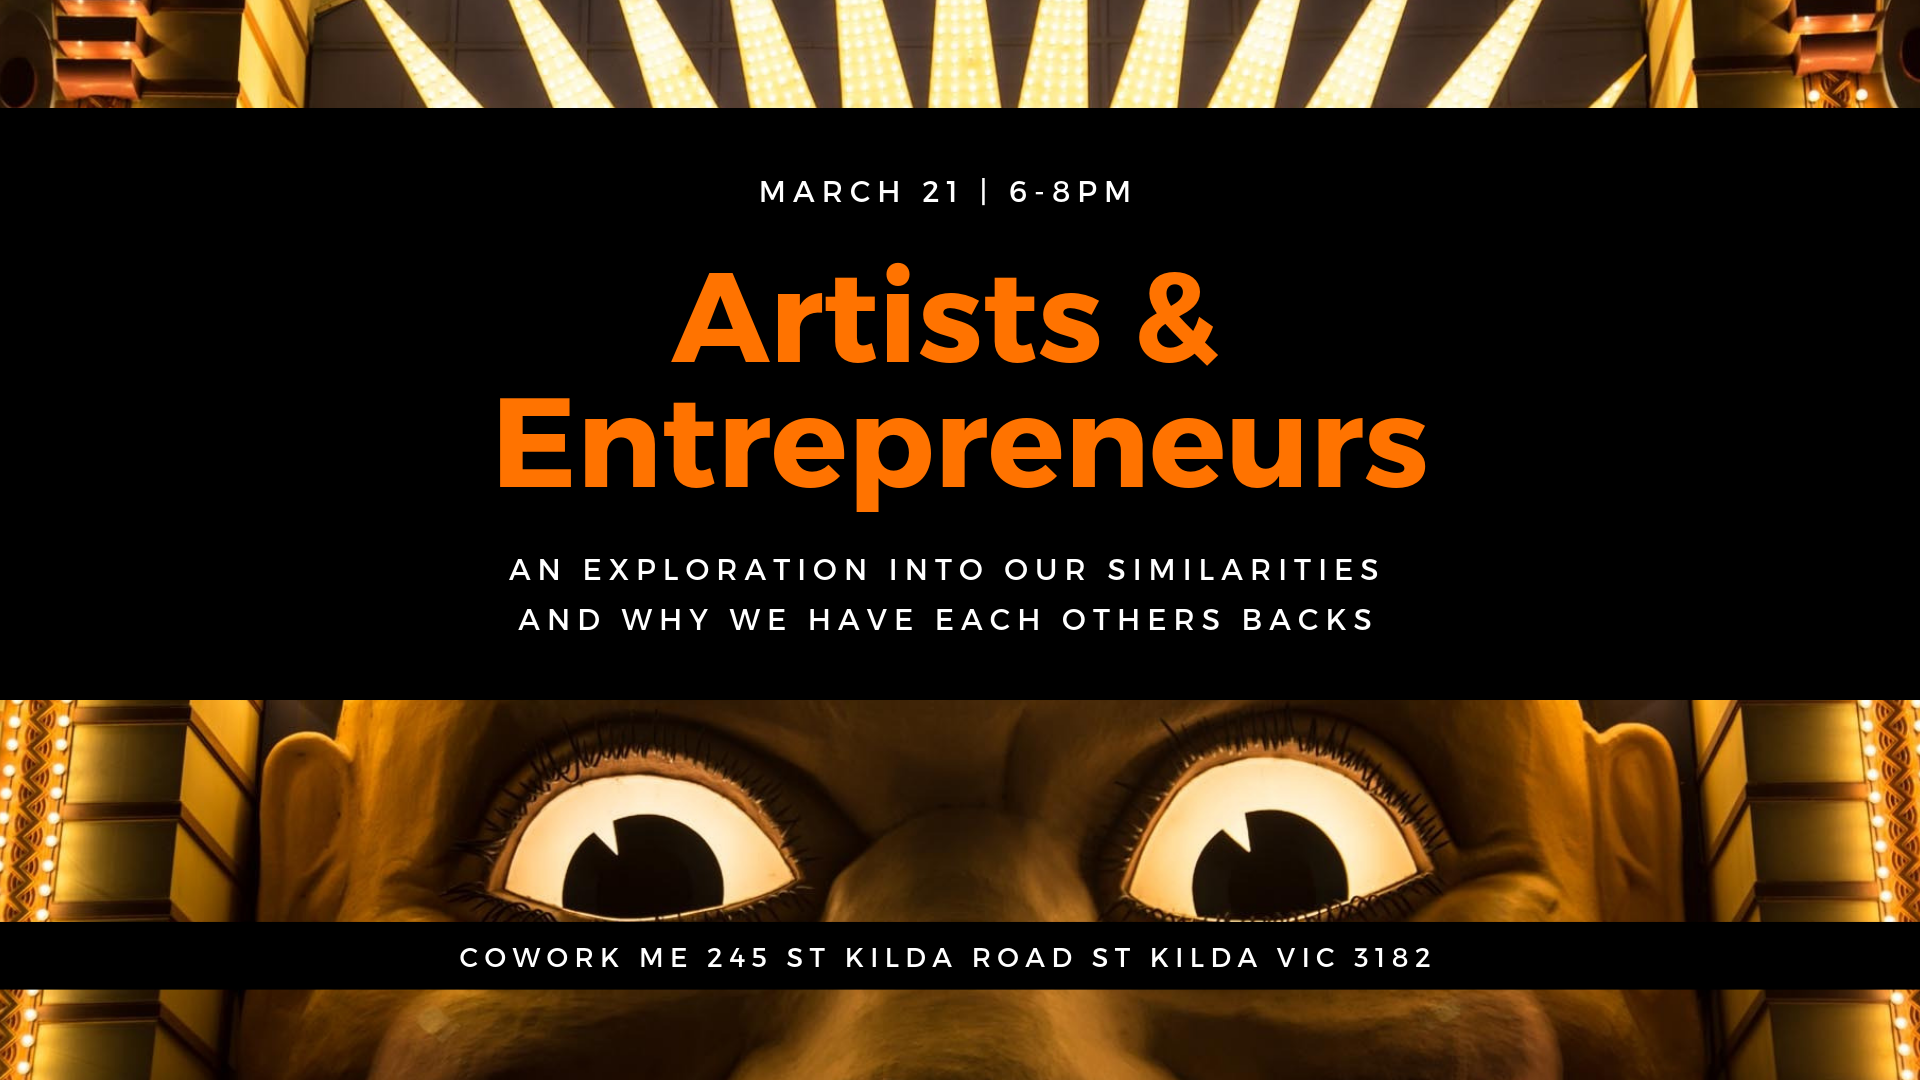 Artists & Entrepreneurs